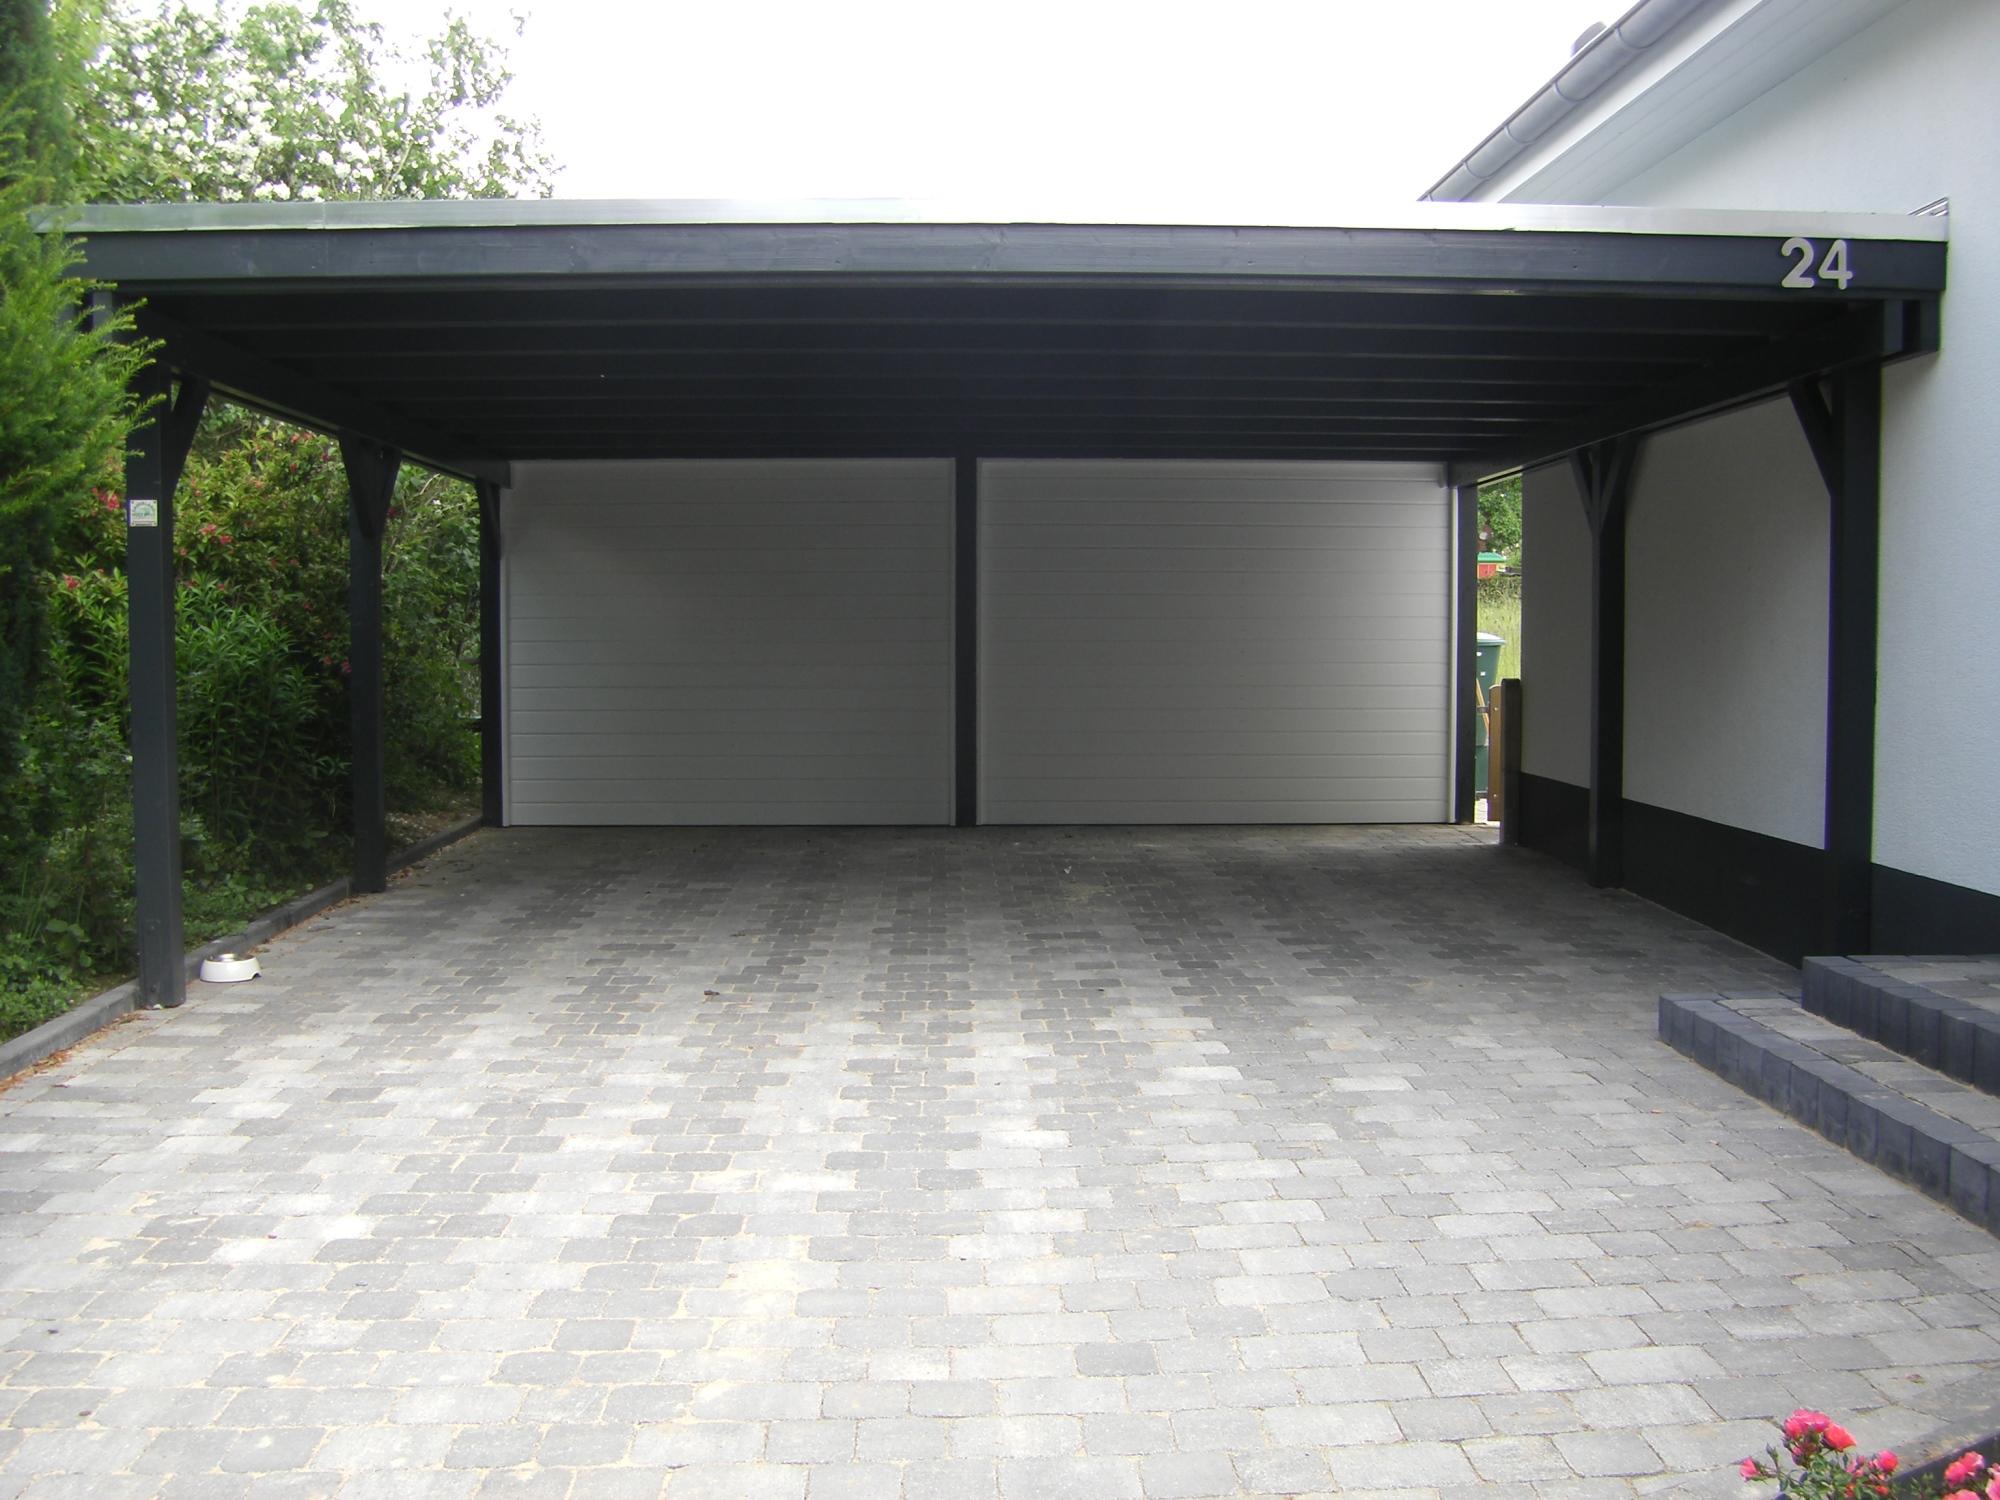 referenzen carports sauerland. Black Bedroom Furniture Sets. Home Design Ideas